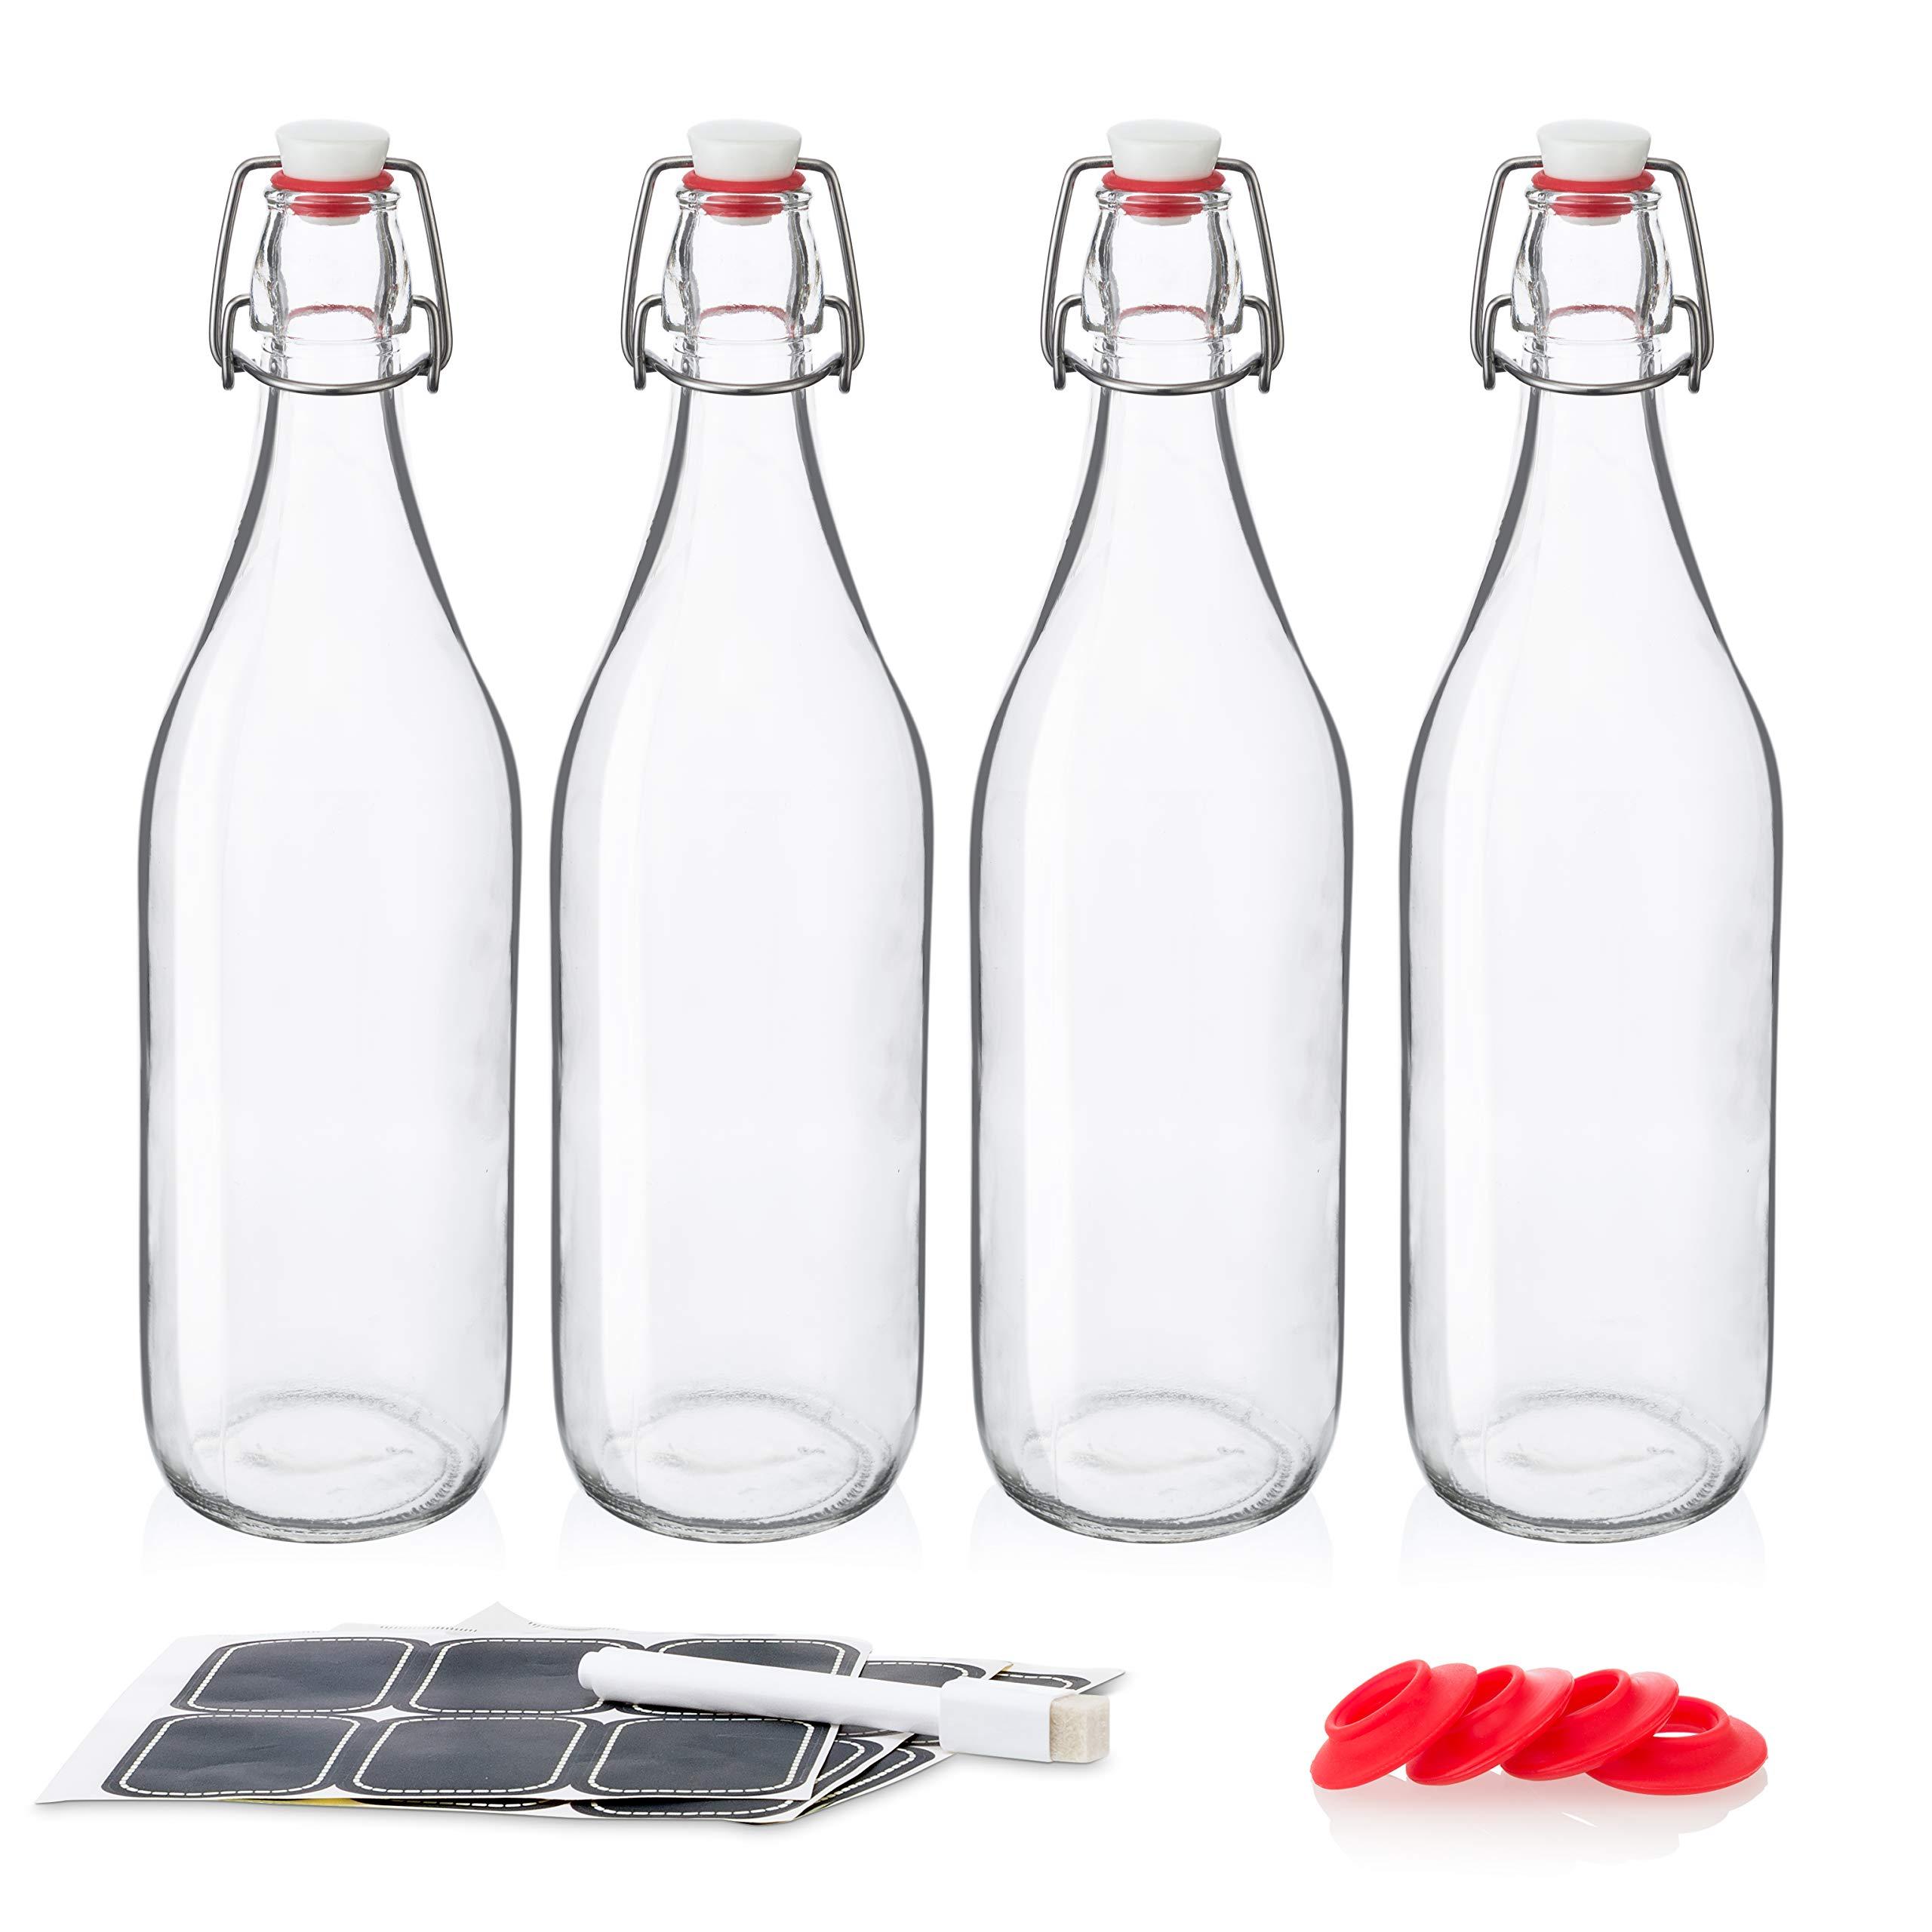 Swing Top Glass Bottles 32oz / 1 Litre - CERAMIC TOPS - Giara Glass Bottles With Stopper Caps - Flip Top Water Bottles - Clear [4pk Set] by Otis Classic